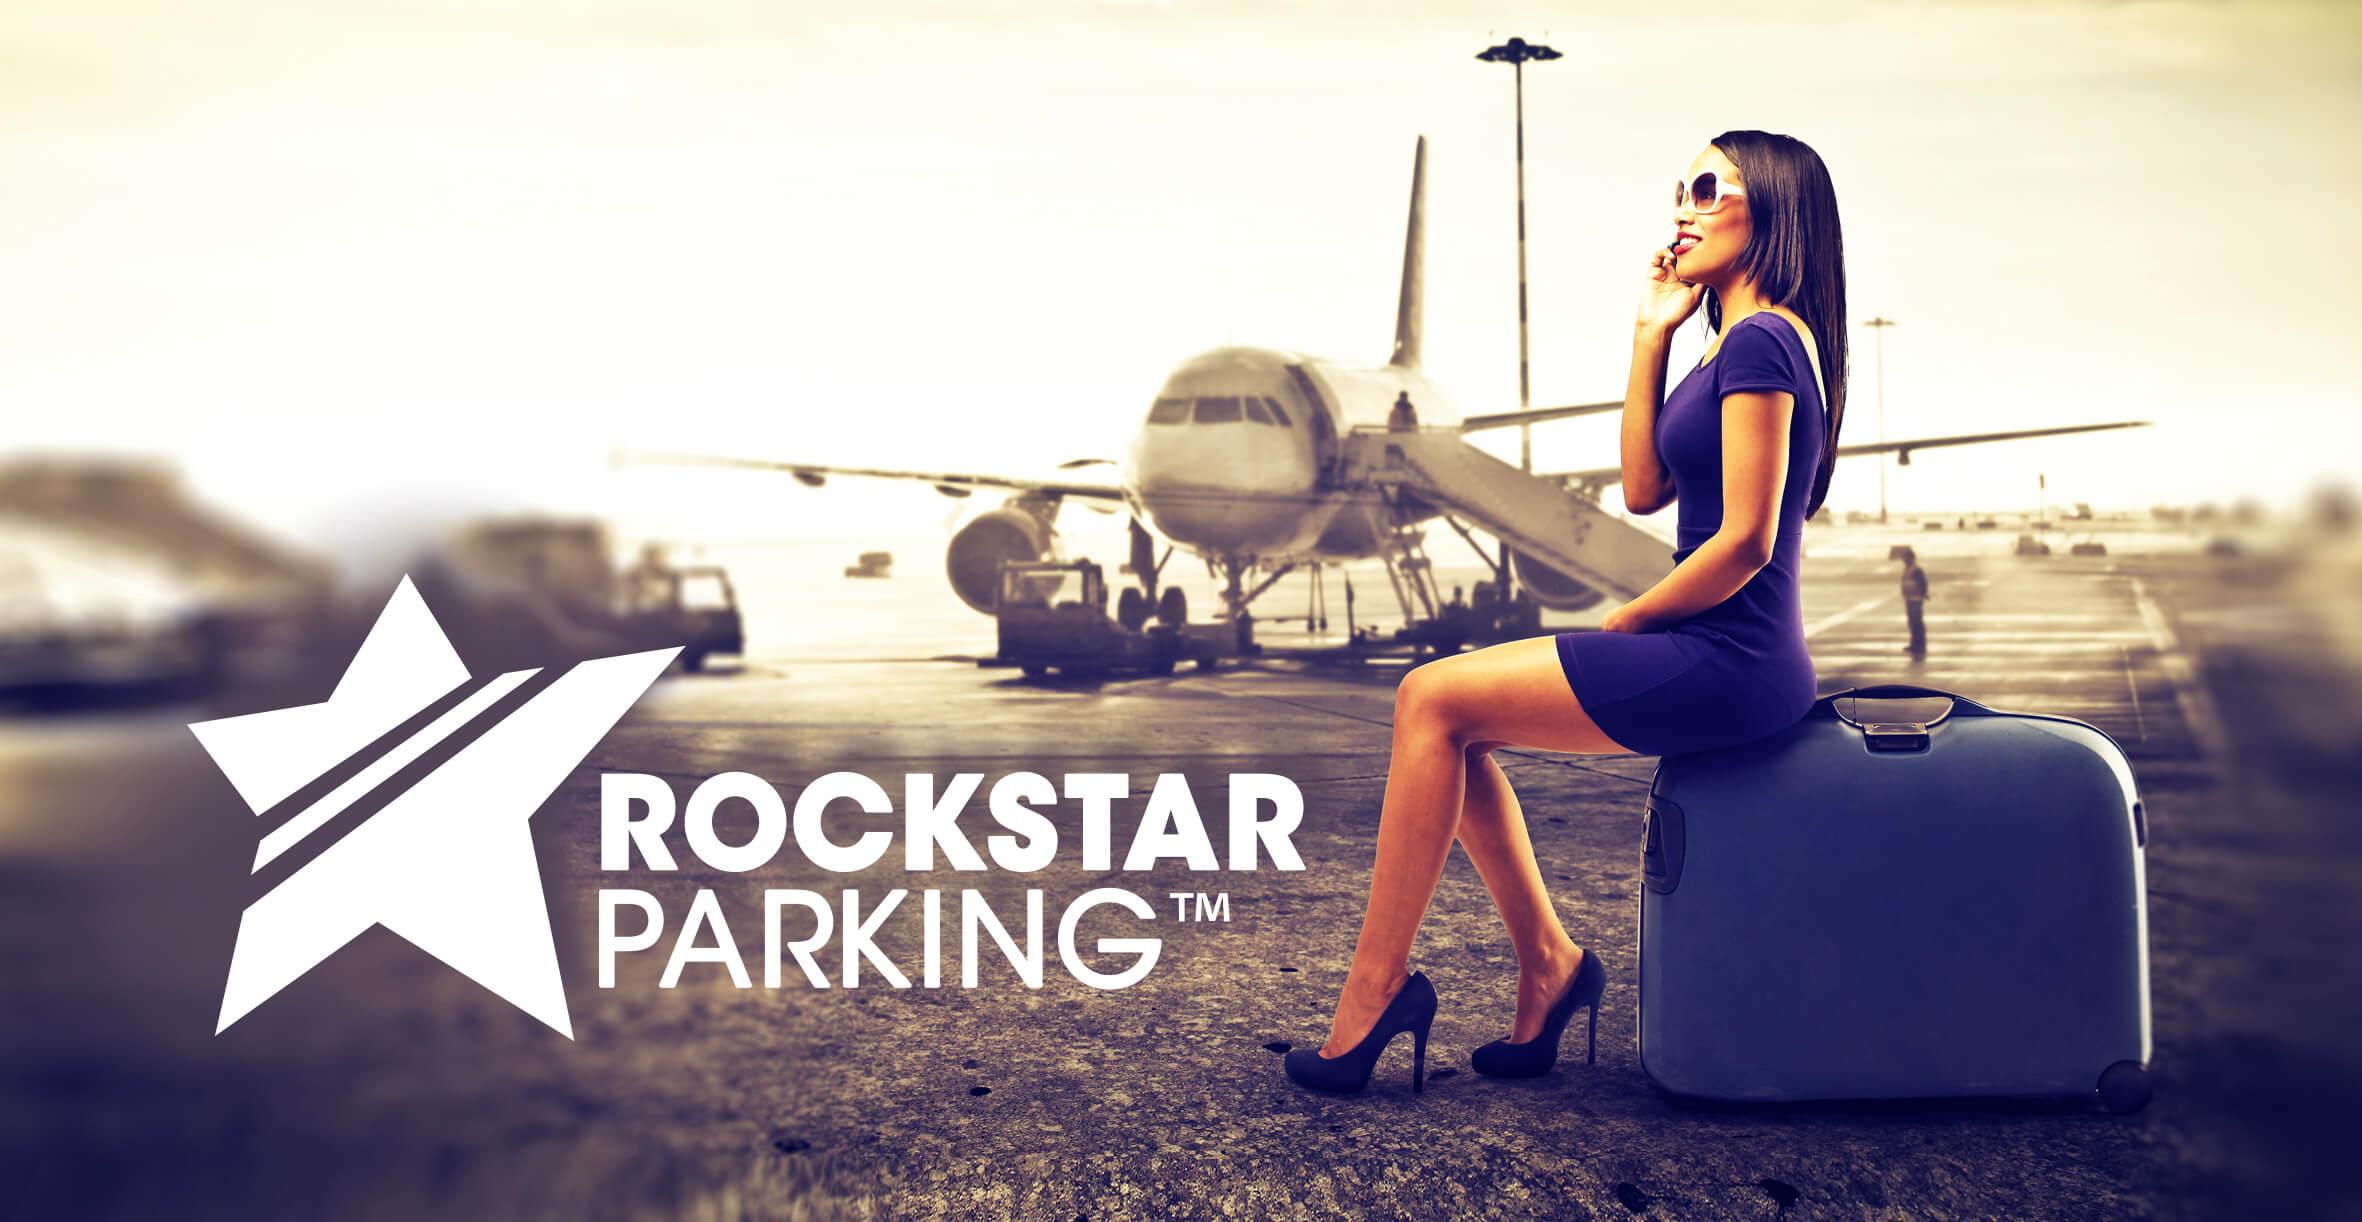 Rockstar Parking Band Identity - Poster Design